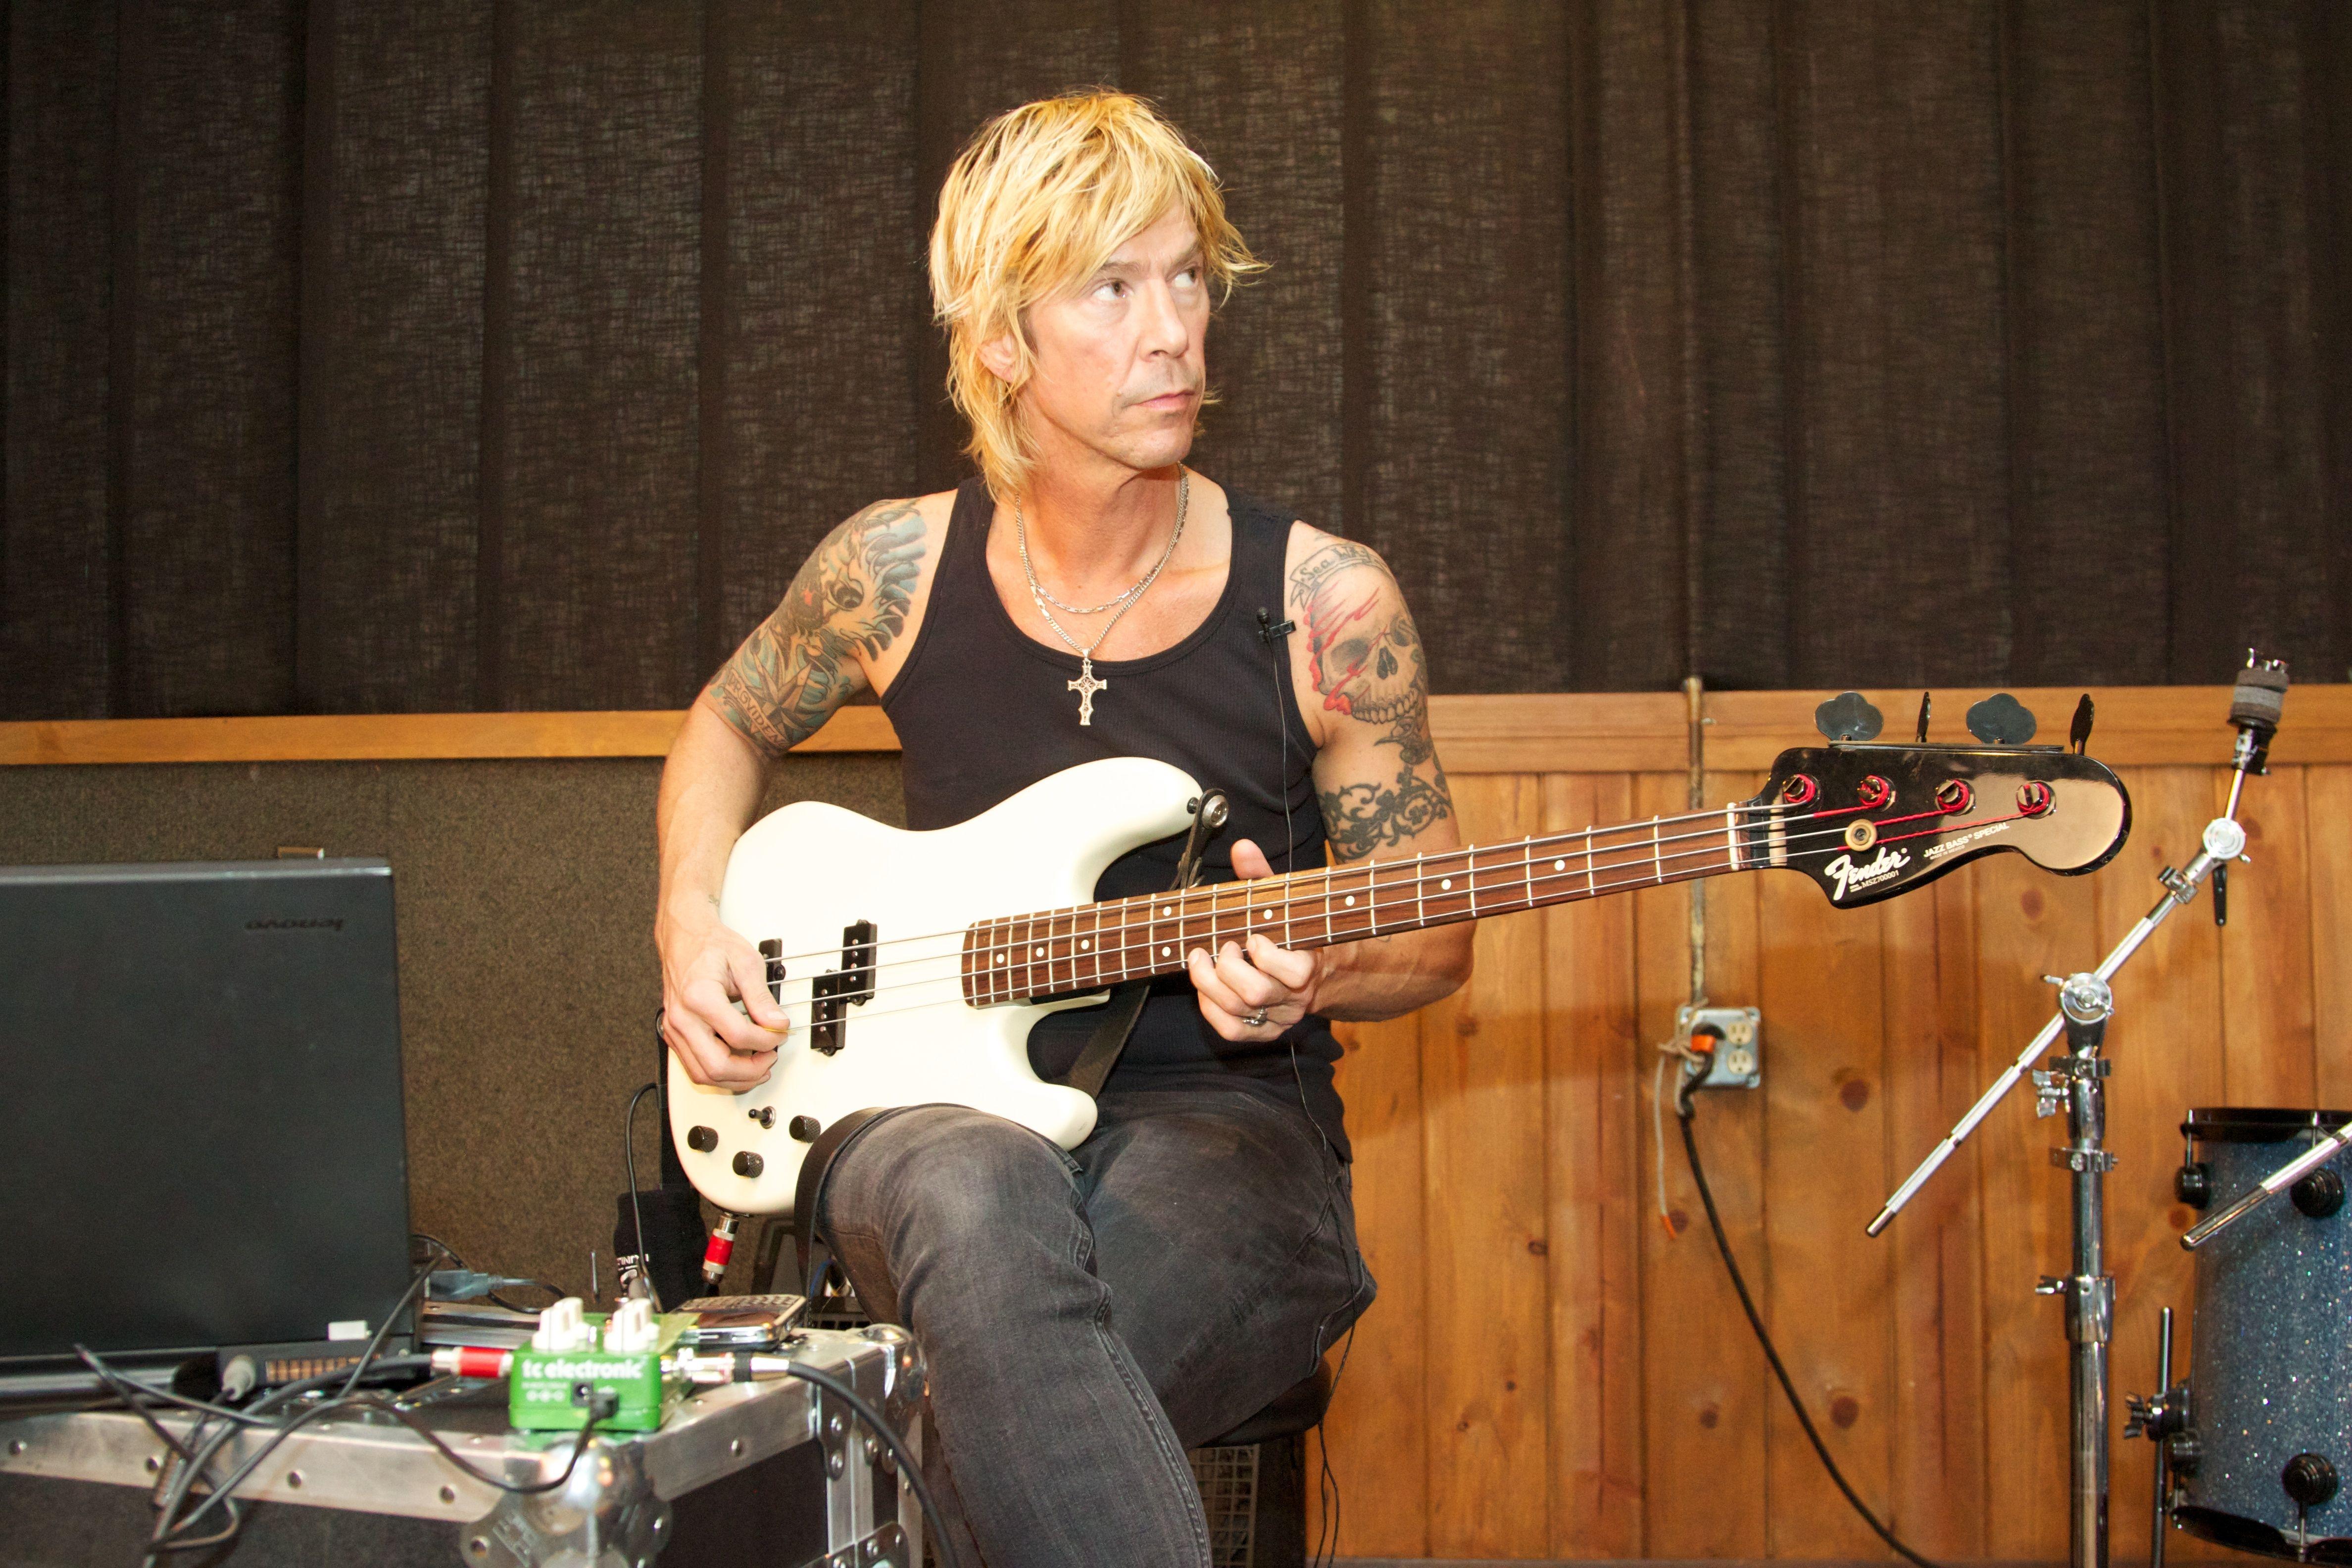 former guns n roses bass player duff mckagan is writing a new